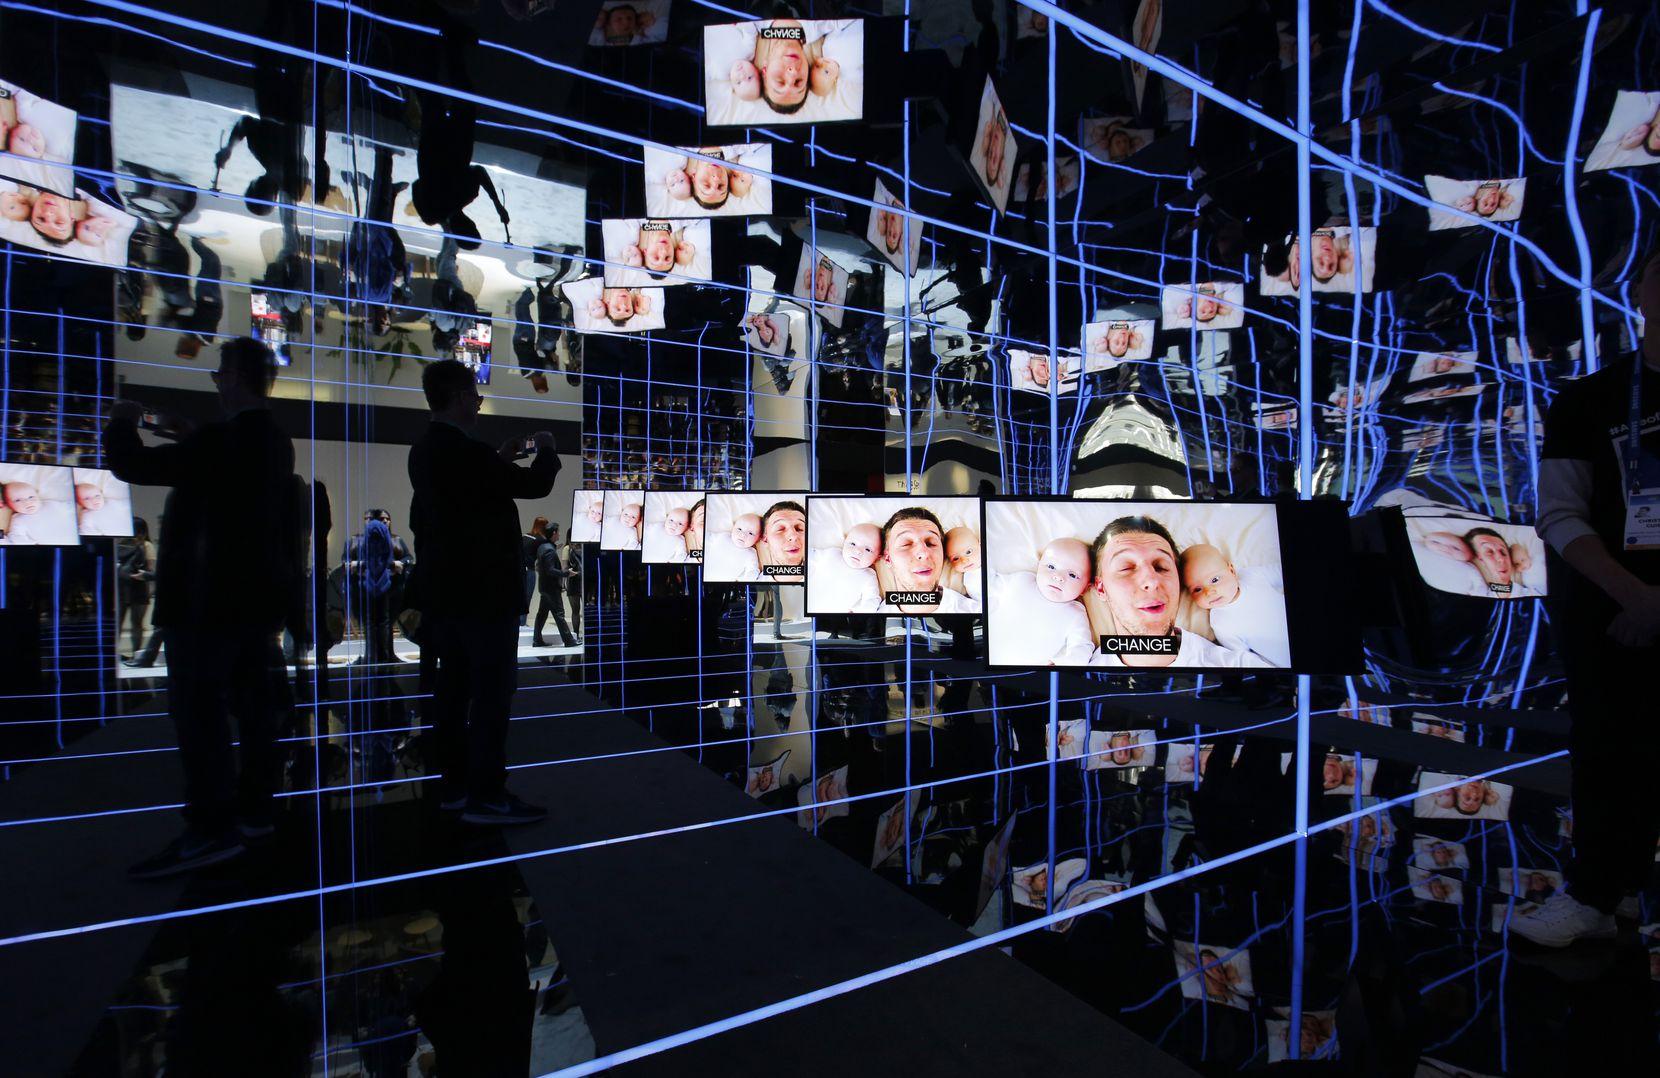 Samsung Sero TVs can rotate to play vertically or horizontally. (AP Photo/John Locher)